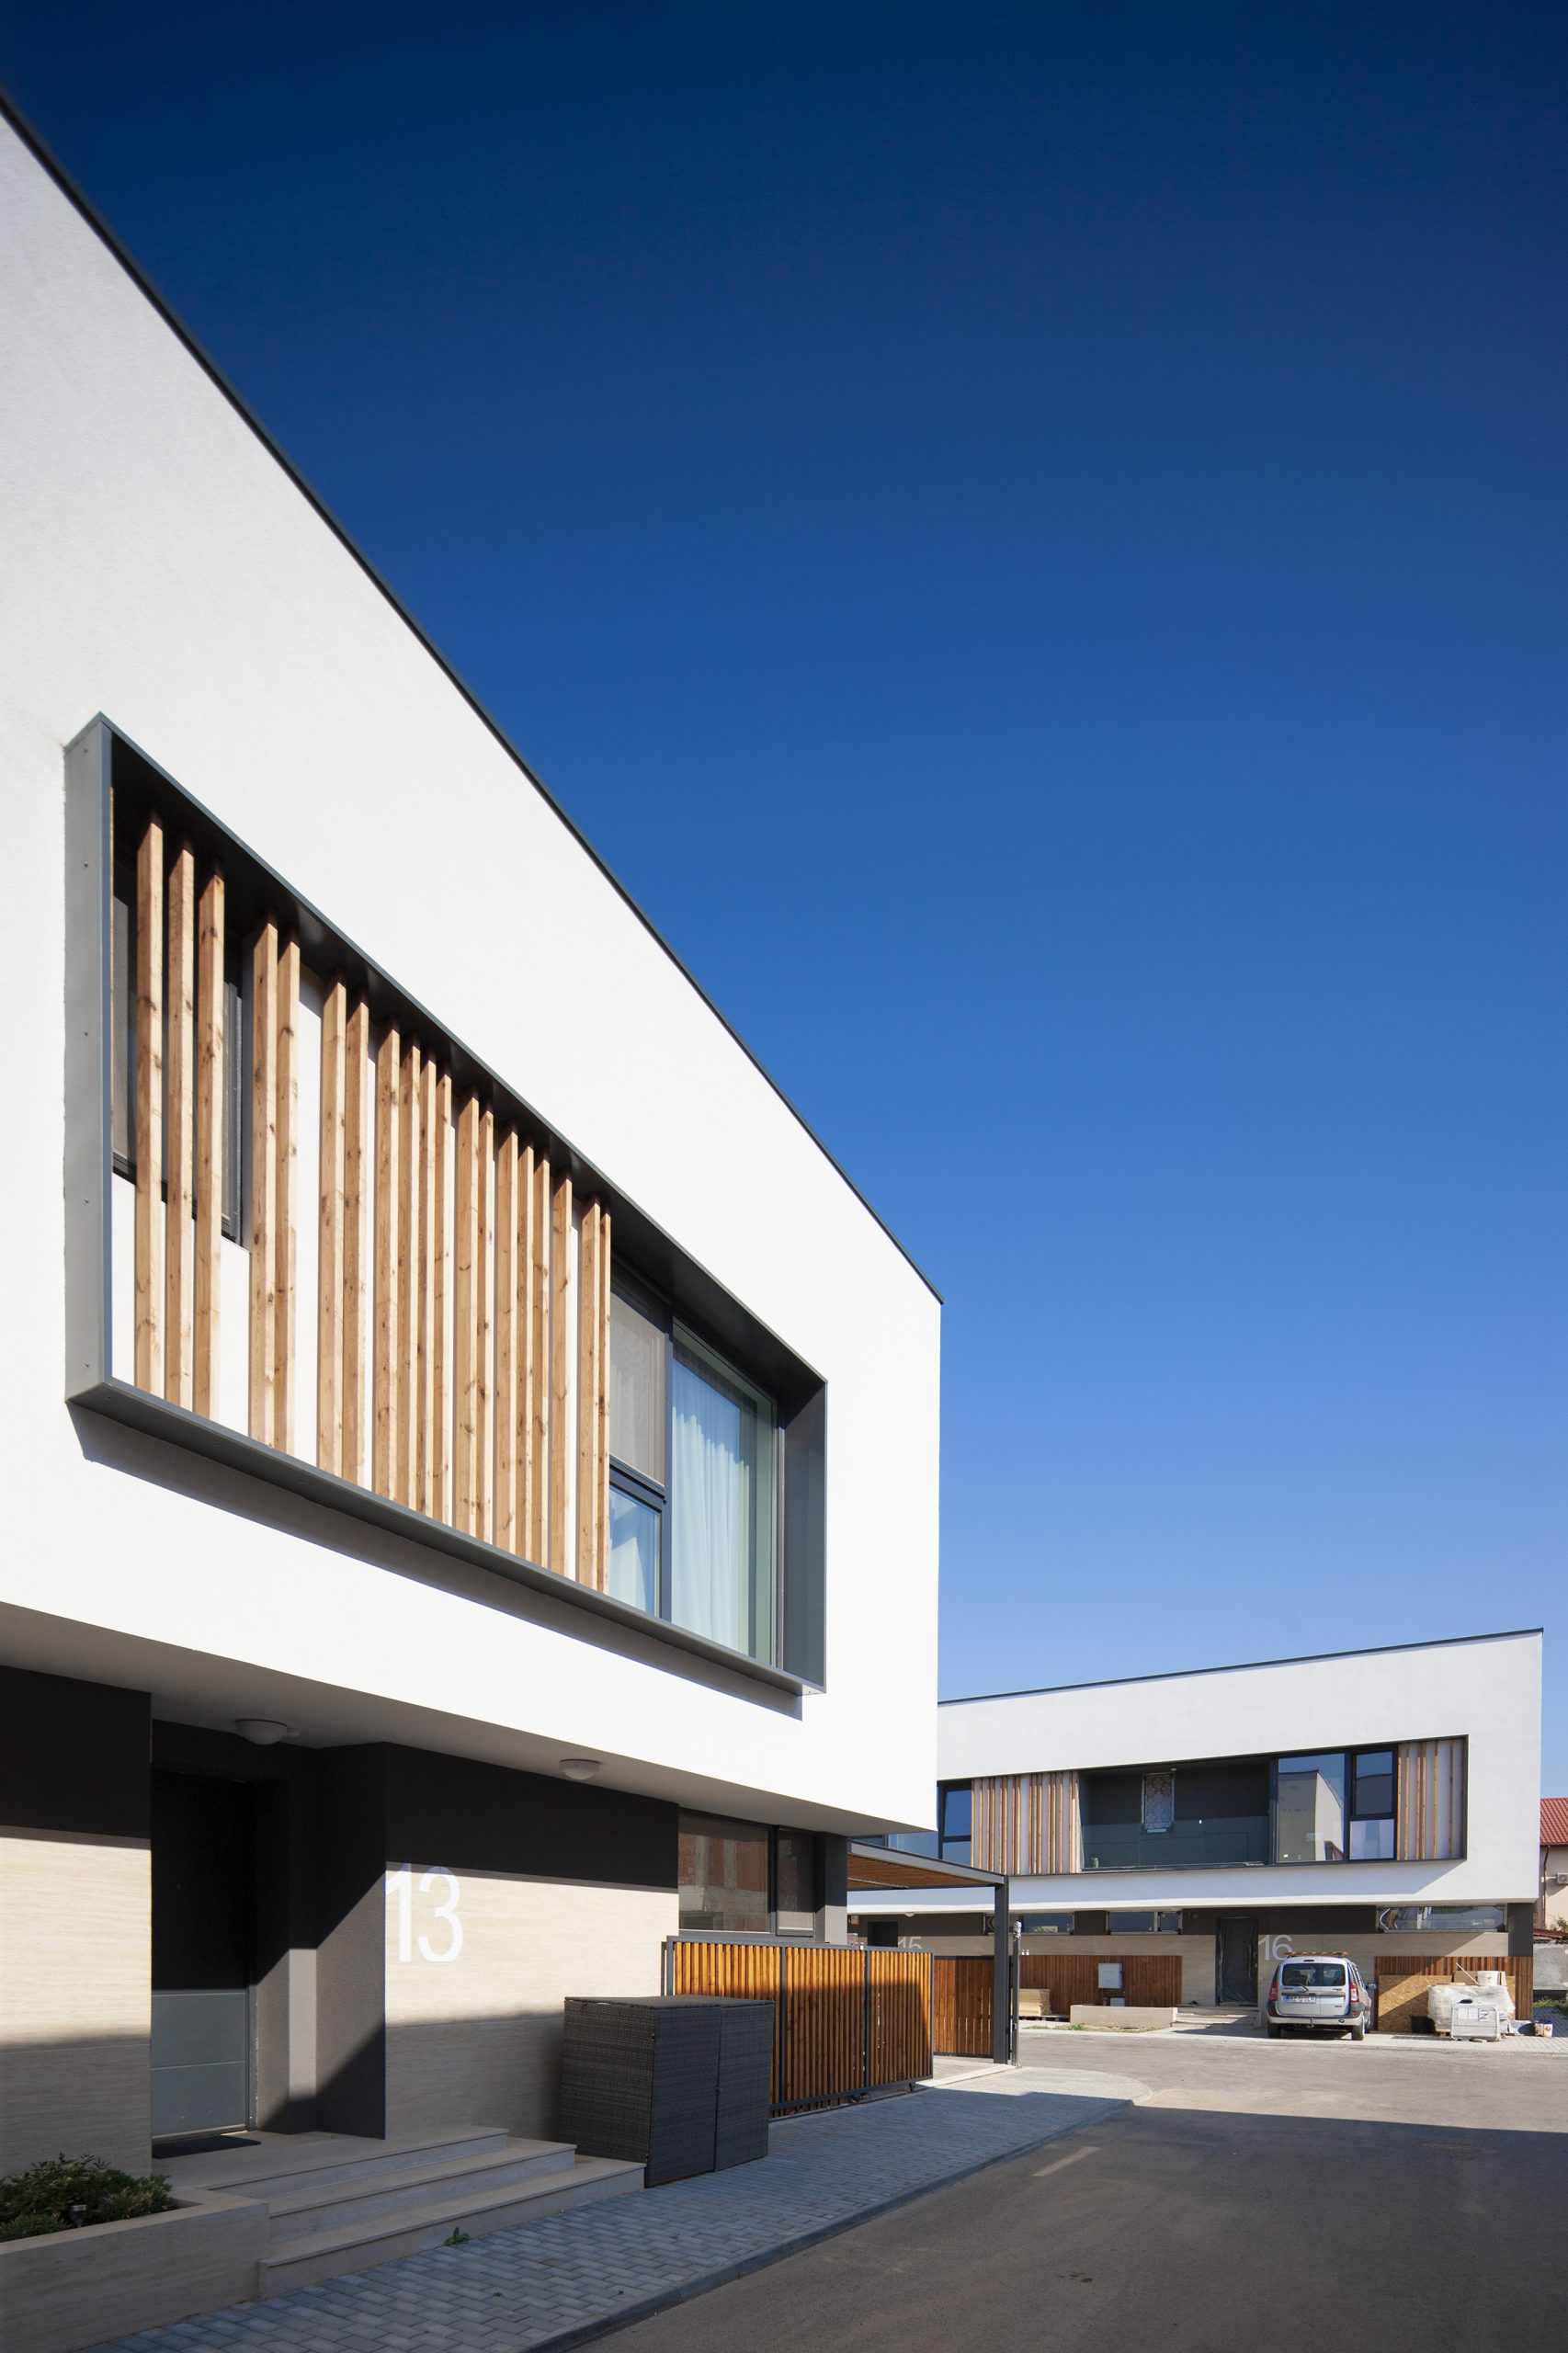 https://nbc-arhitect.ro/wp-content/uploads/2020/10/NBC-Arhitect-_-residentials-_-Contemporan-Residence-_-Bucharest-Romania_6-1-scaled.jpg